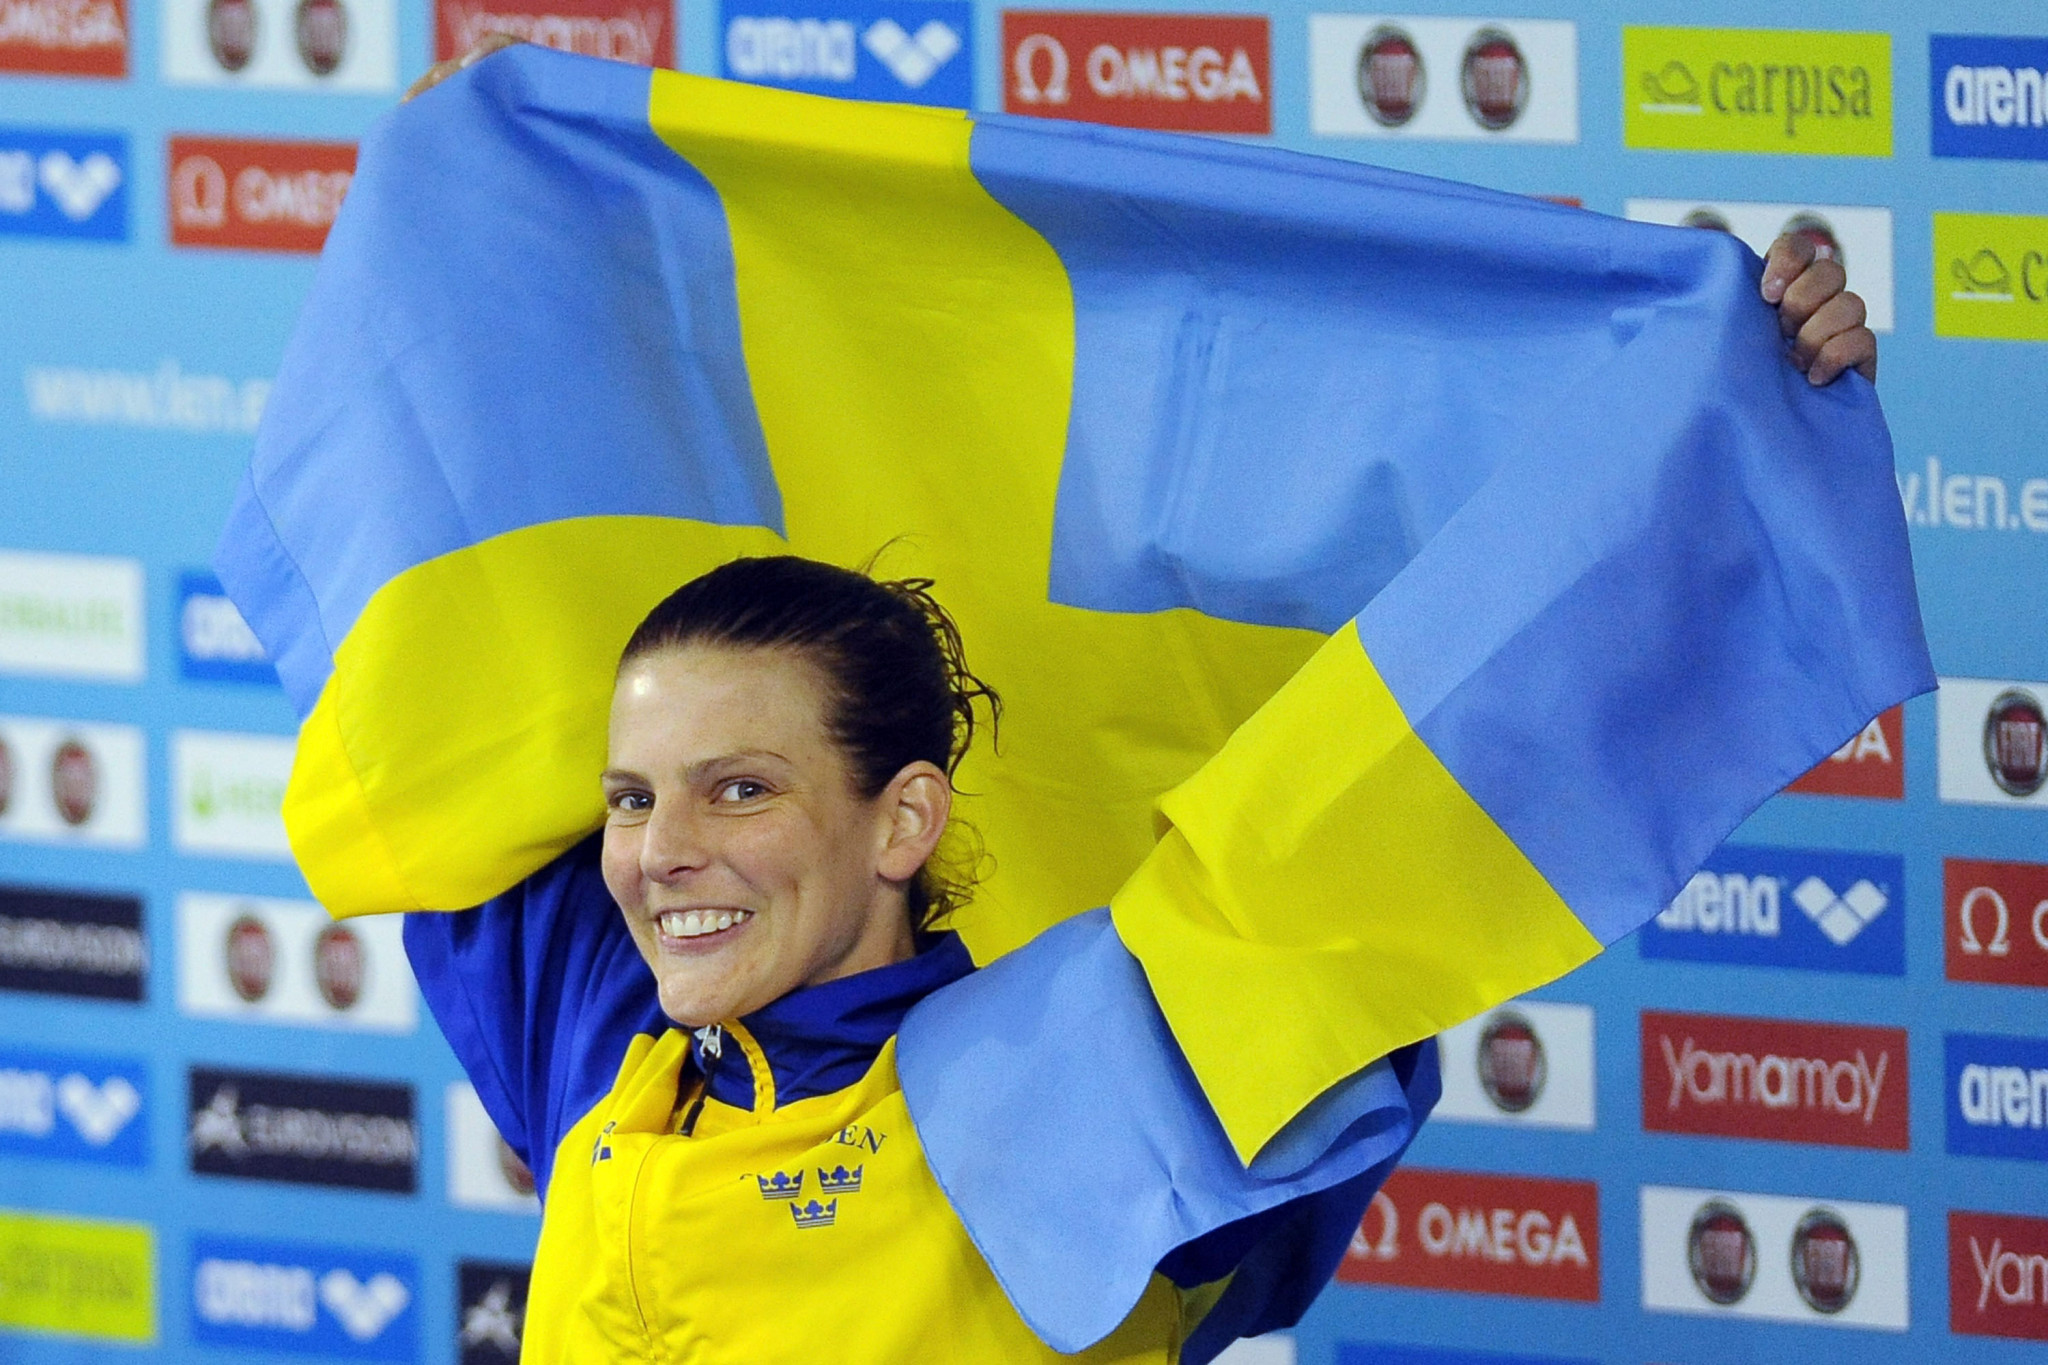 Swedish diver Anna Lindberg has urged backing for Stockholm Åre 2026 ©Getty Images